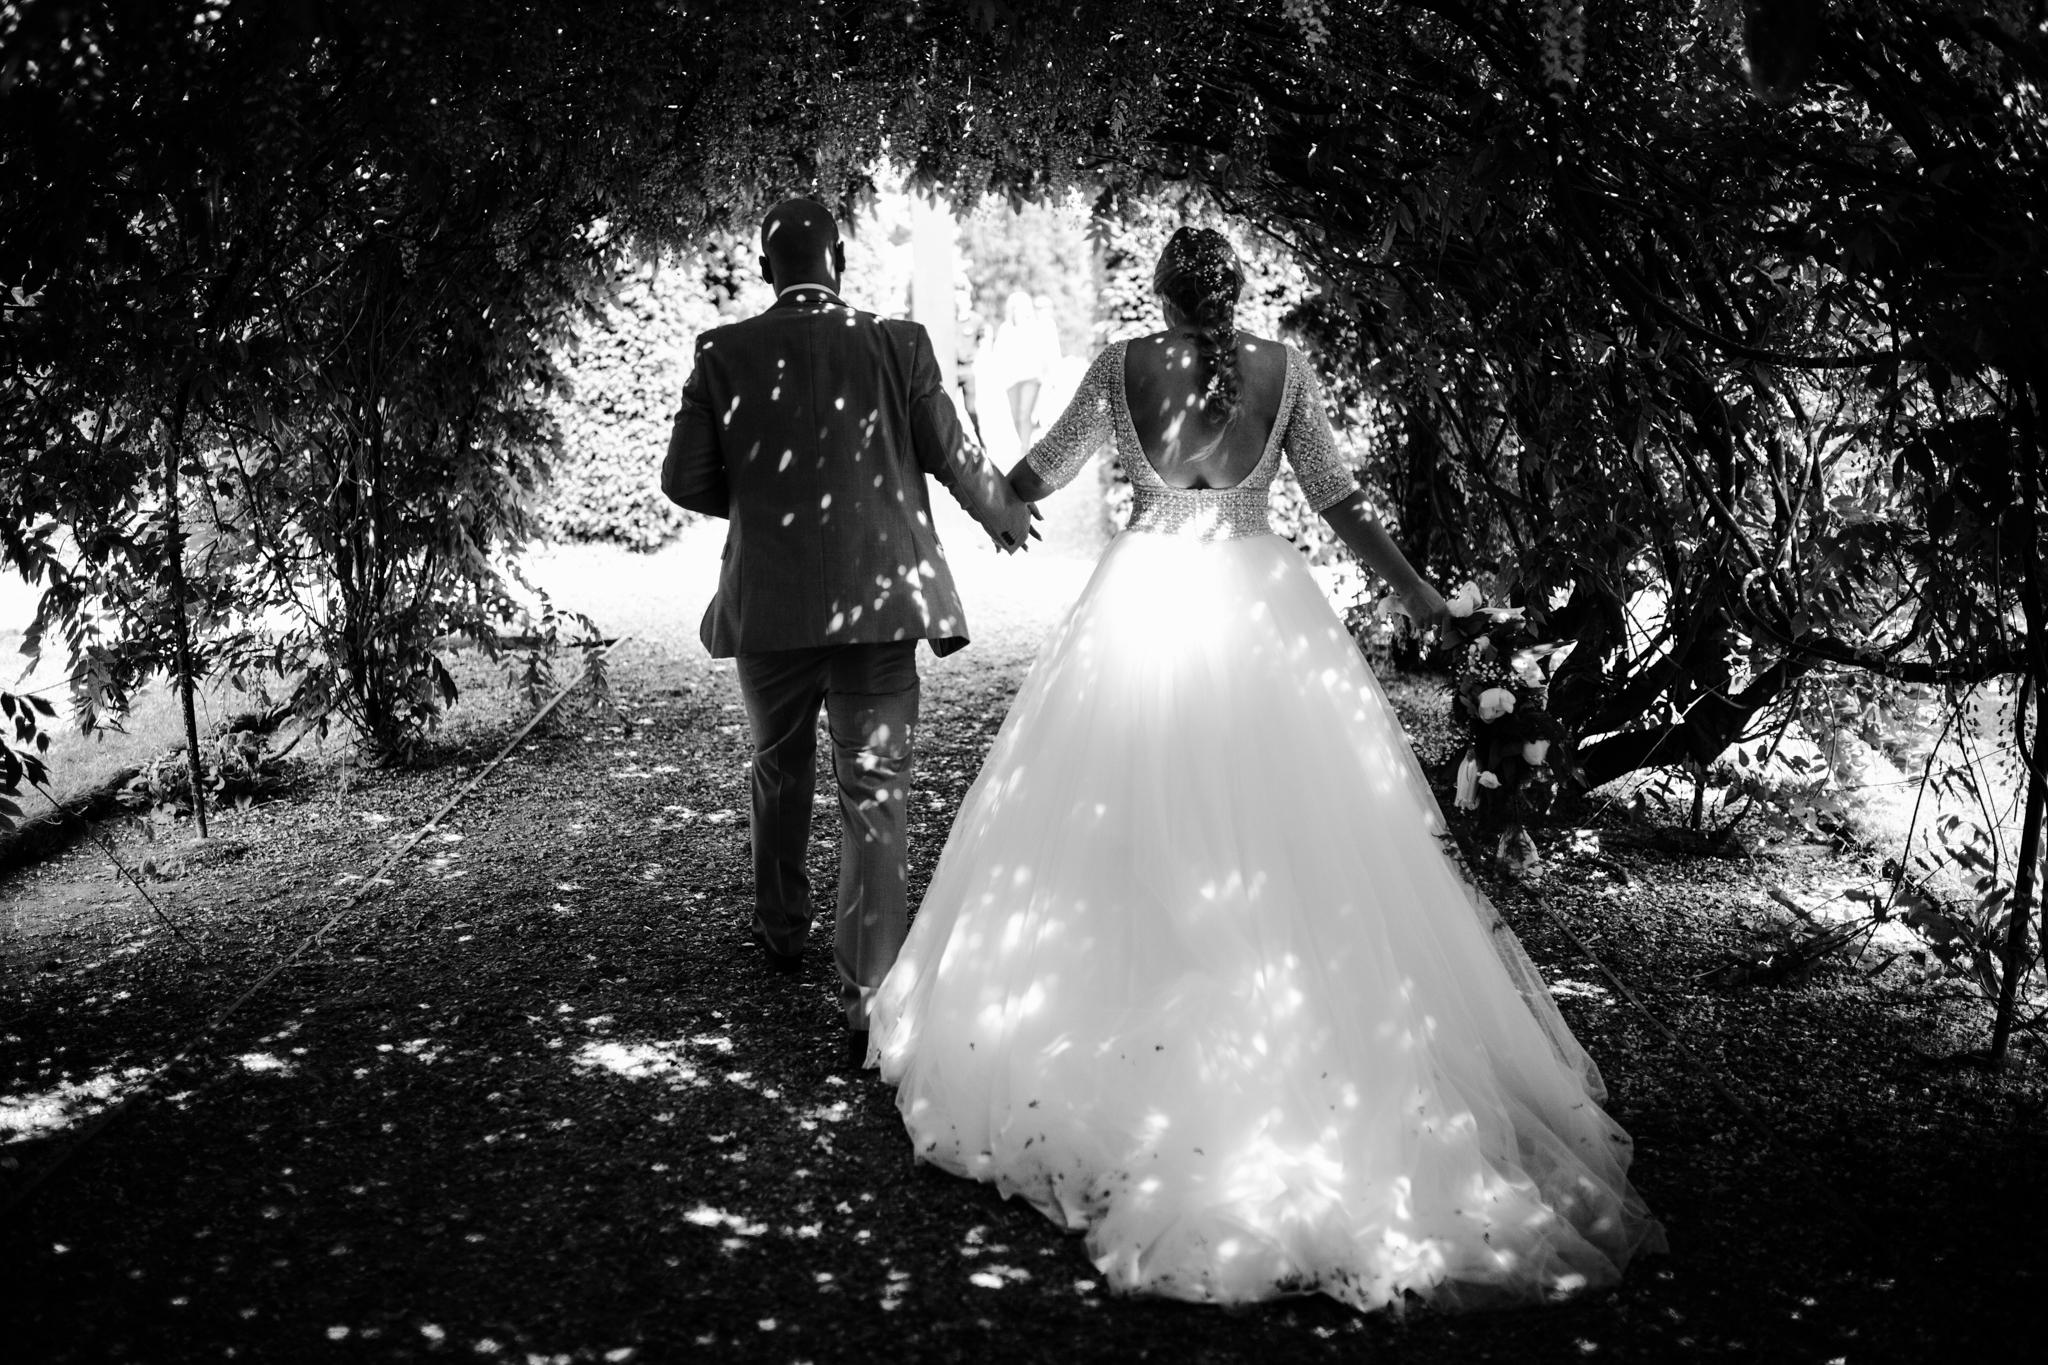 dappled light on bride and groom